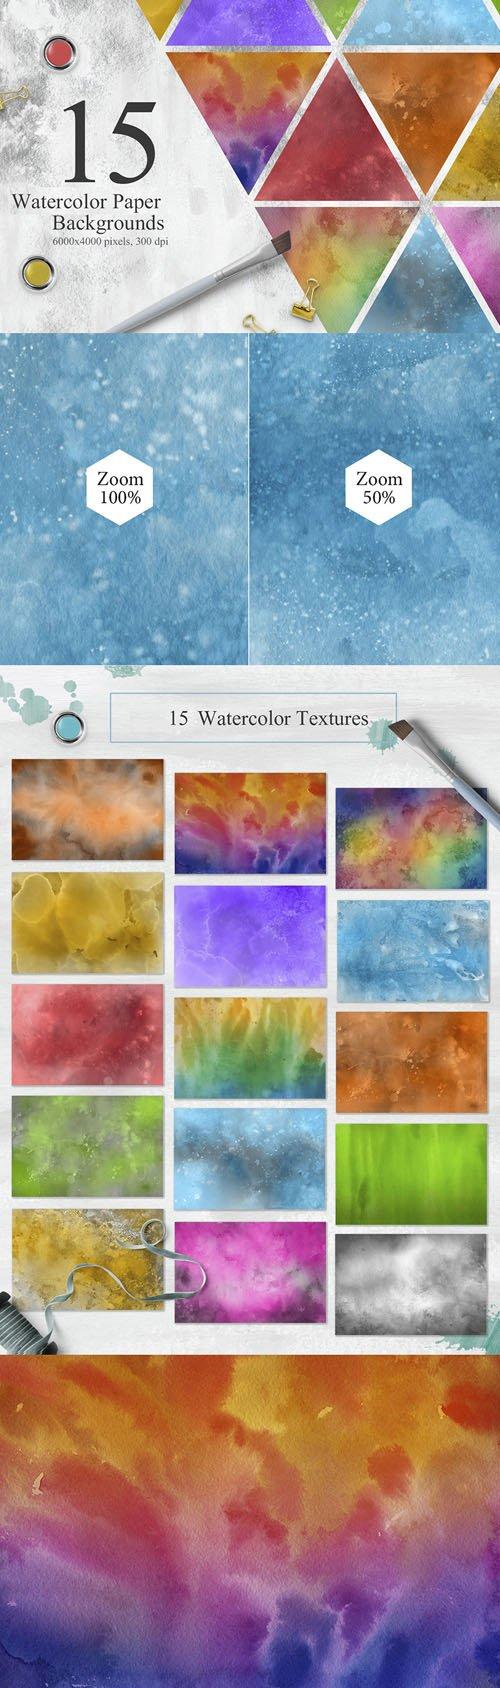 15 Watercolor Textures Backgrounds